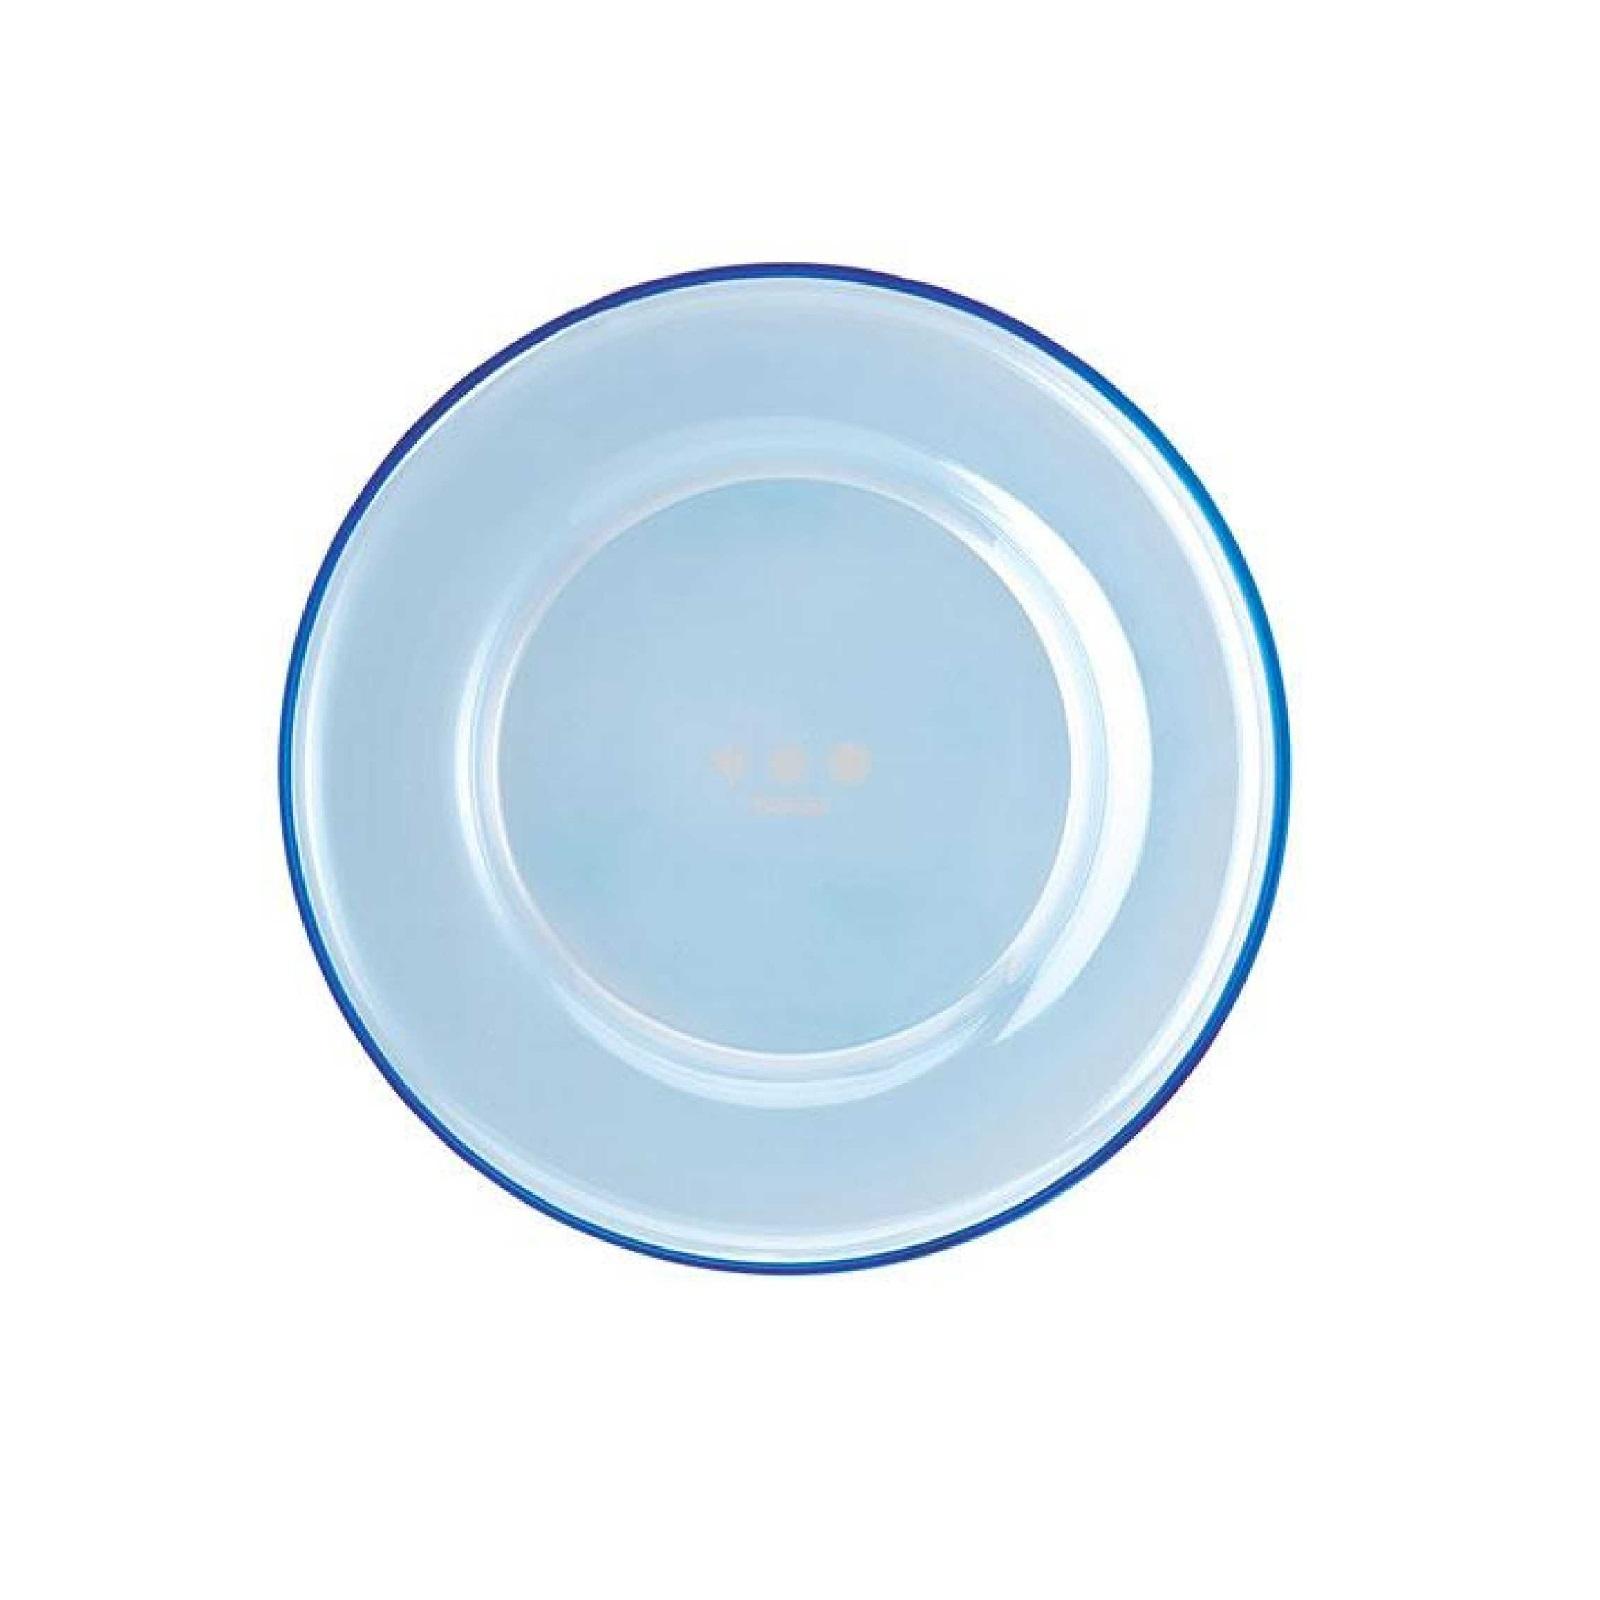 Блюдо стеклянное Rosenthal SUNNY DAY, диаметр 27 см, голубой Rosenthal 69034-408530-45027 фото 2